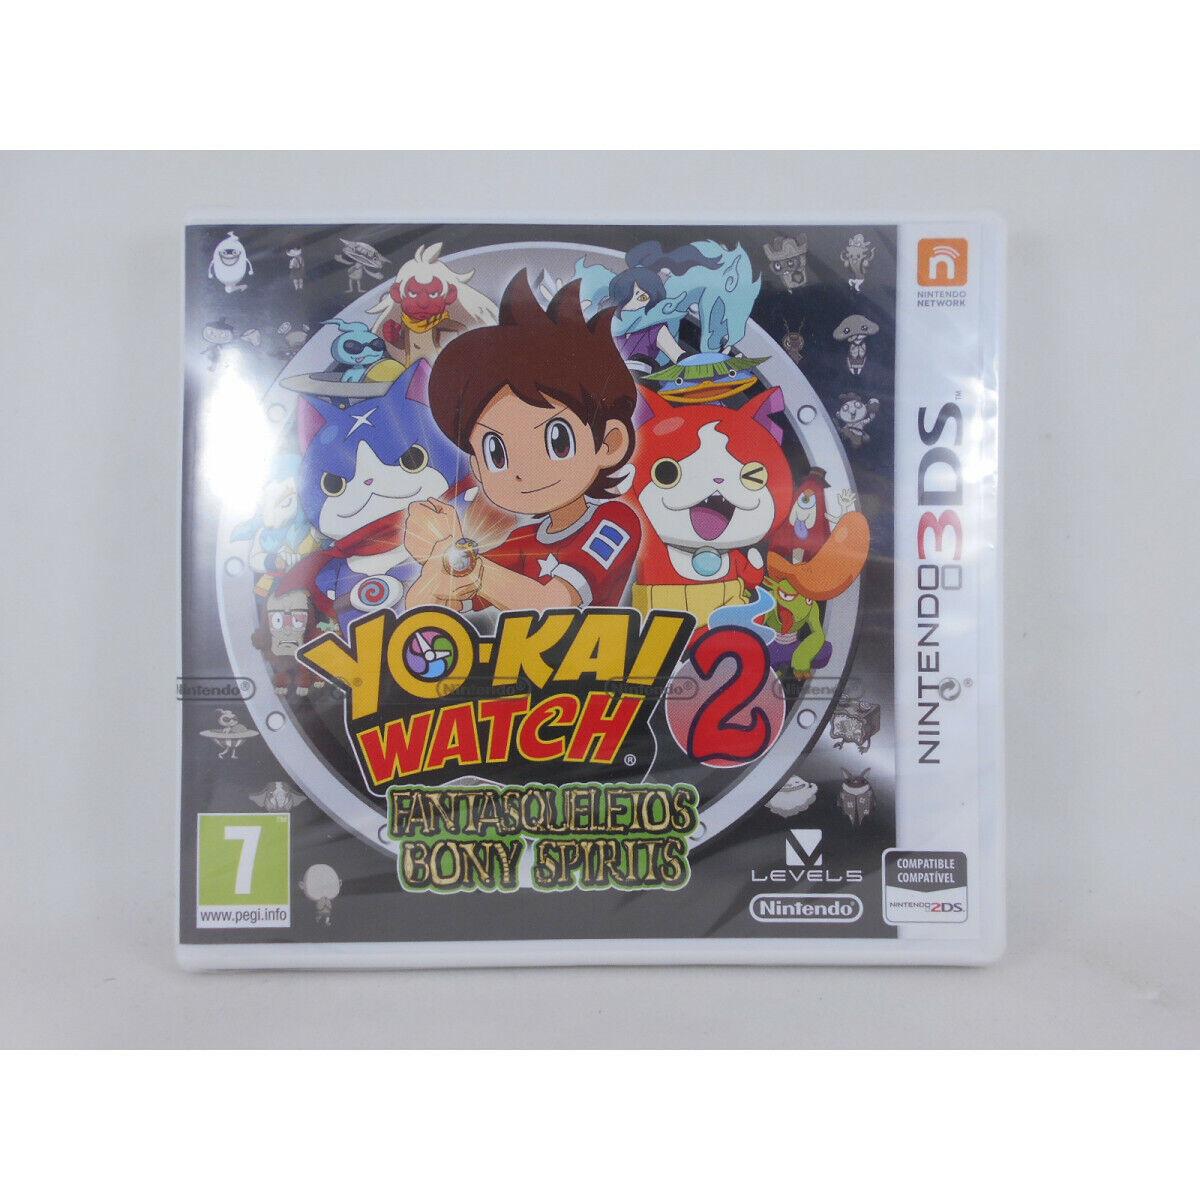 Yo-Kai Watch 2 Fantasqueletos/Bony Spirits - Nintendo 3DS - Nuevo a Estrenar...